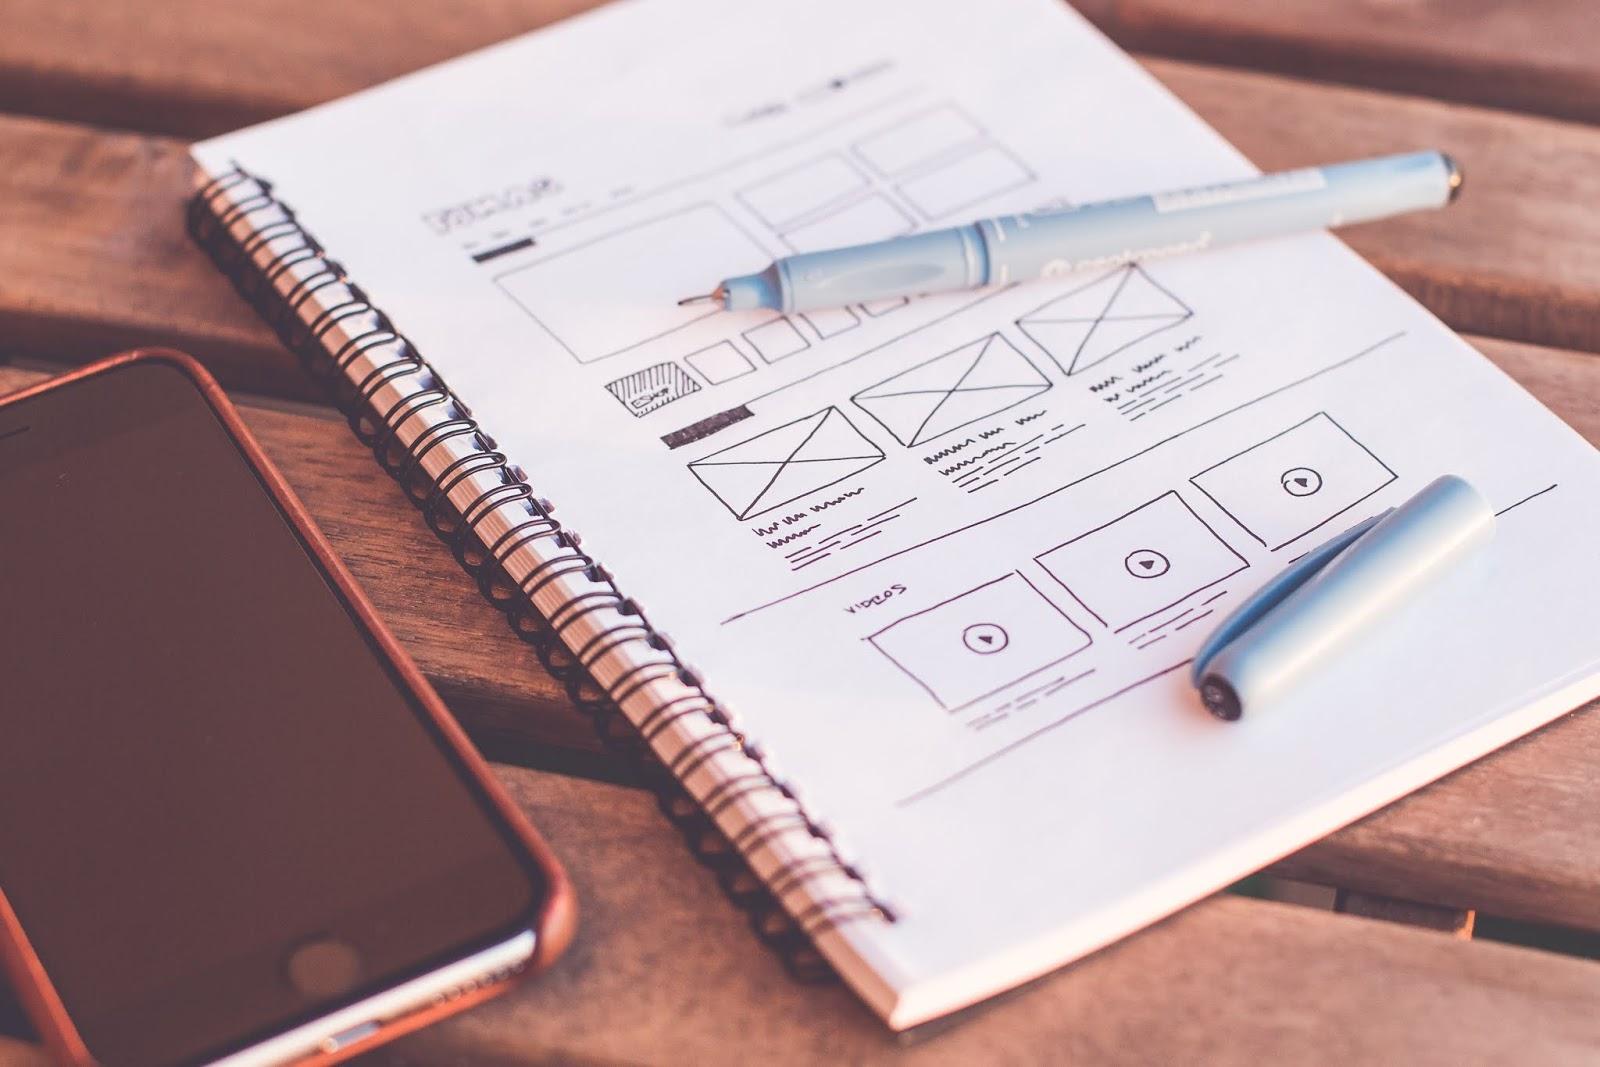 Our Web Design Service Process